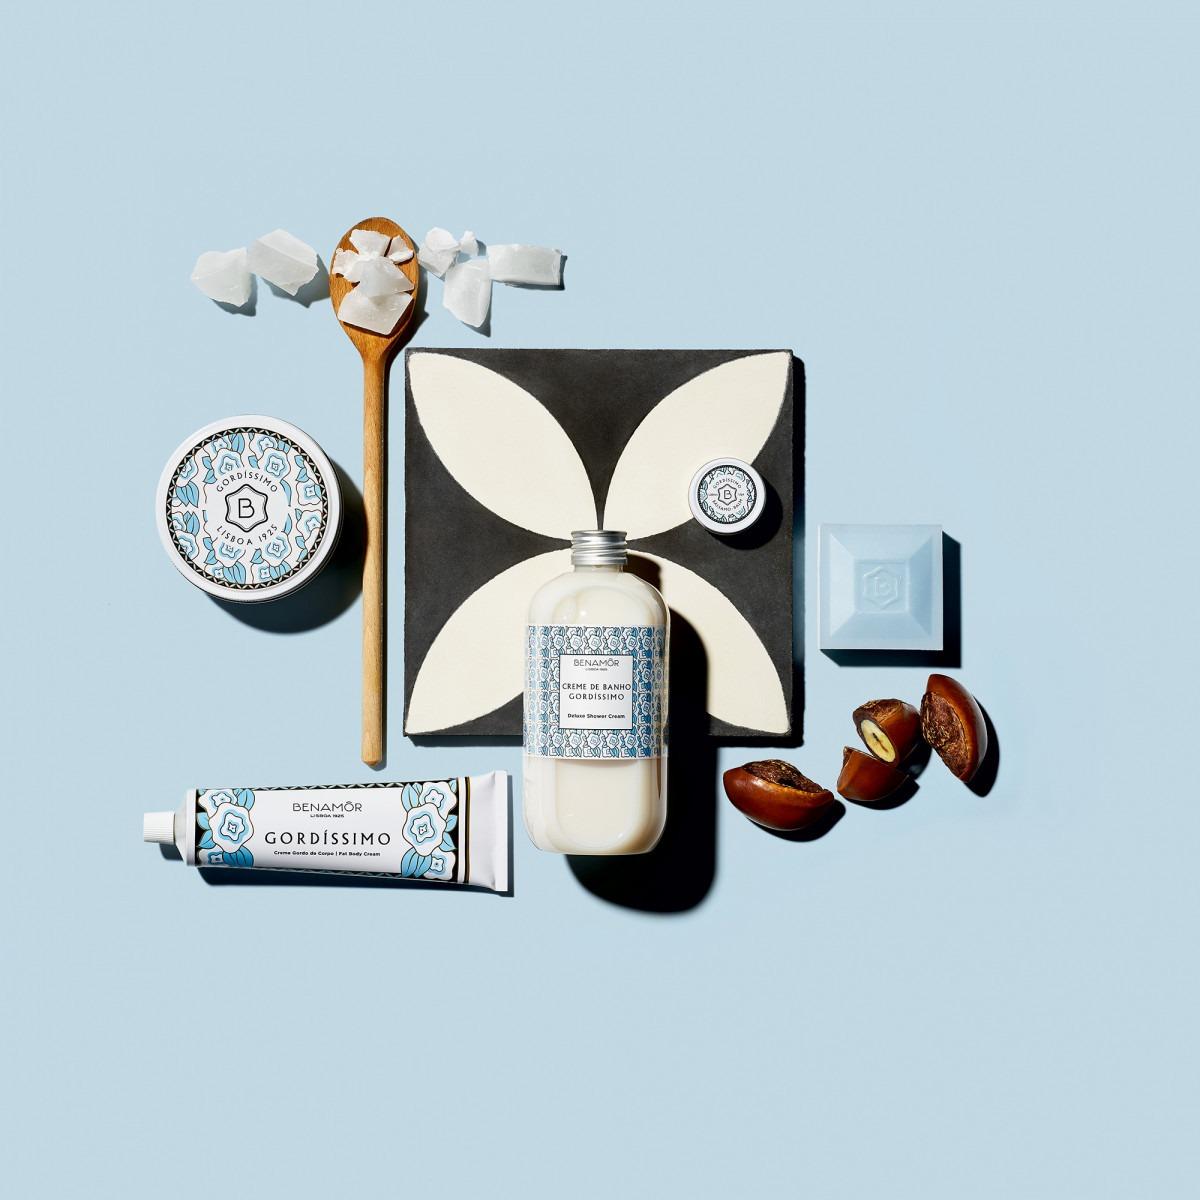 Benamôr Gordíssimo Protective Hand Cream 50ml